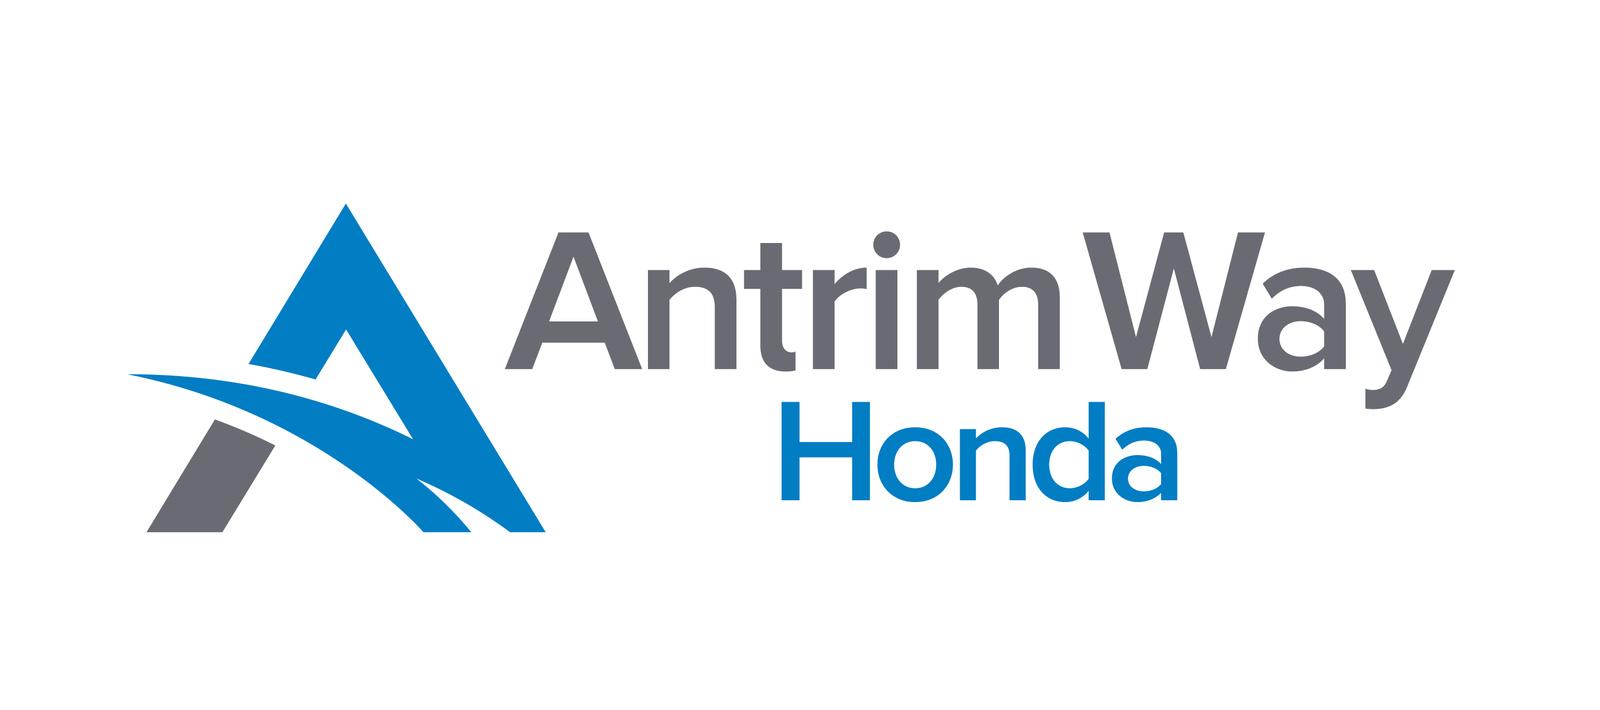 Antrim Way Honda - Greencastle, PA: Read Consumer reviews ...